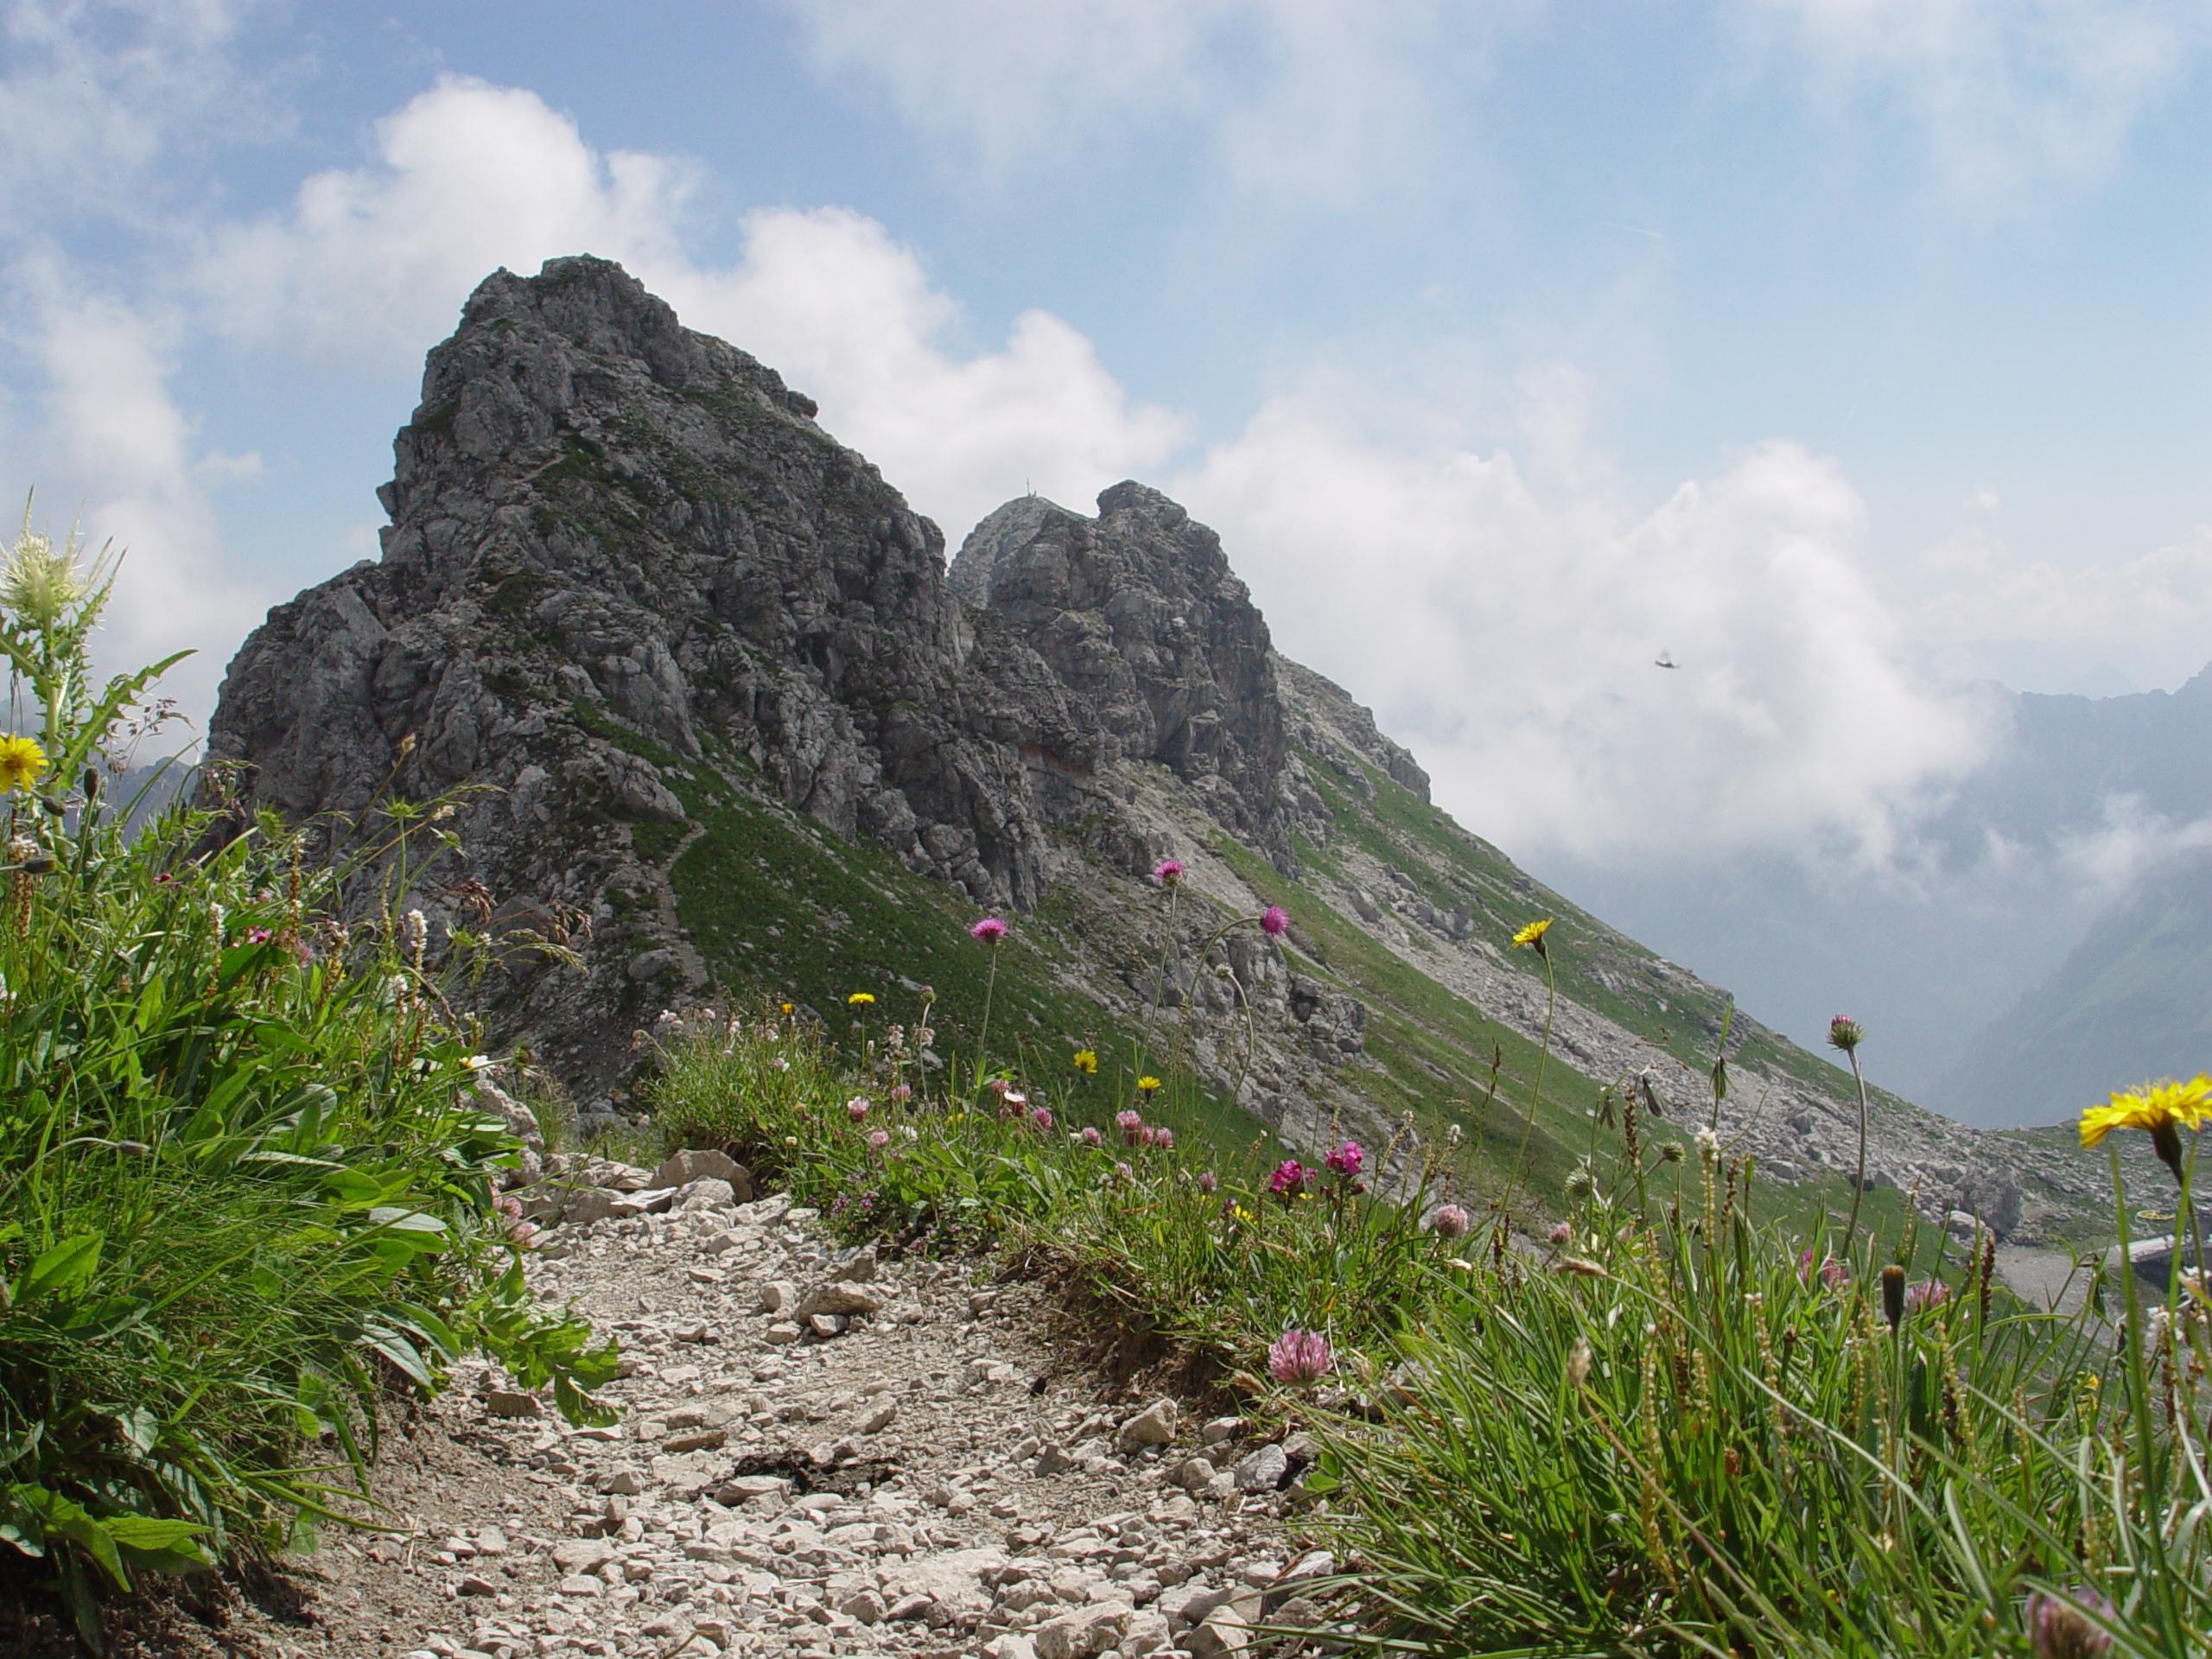 Klettersteig Nebelhorn : Hindelanger klettersteig bergsteigen